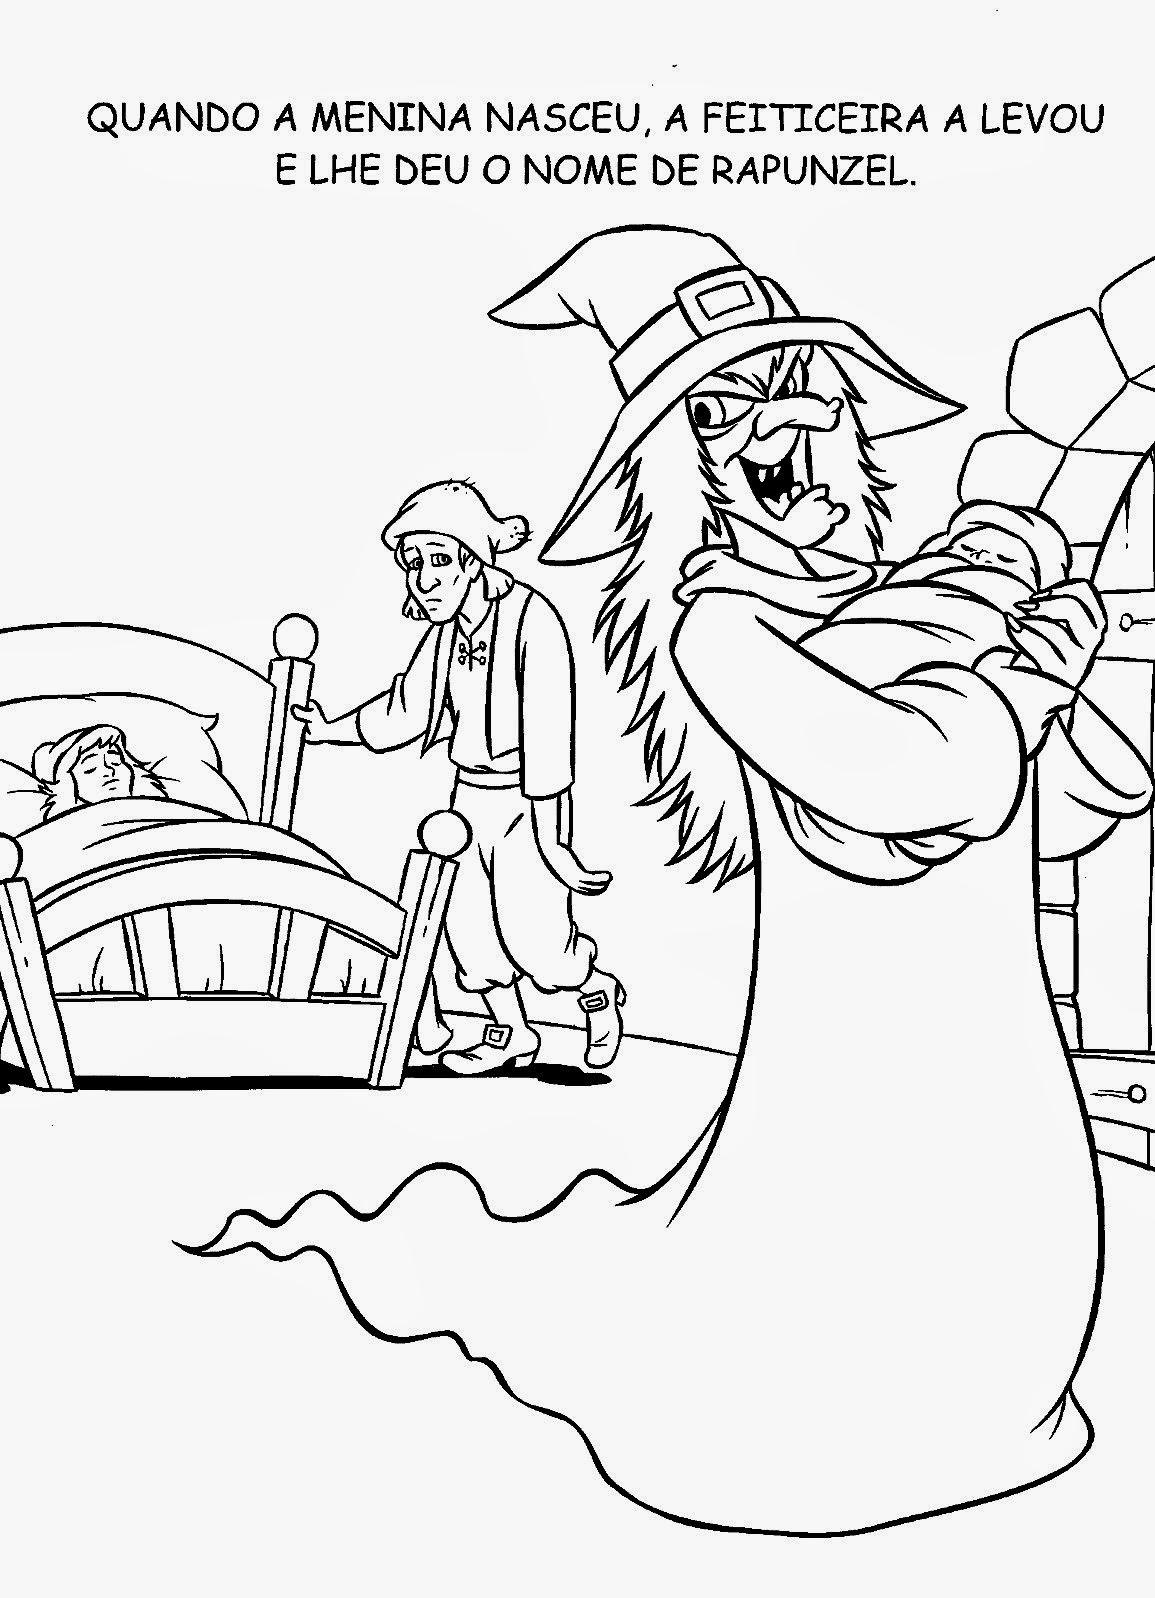 Rapunzel Para Pintar Online Dibujos Para Colorear Rapunzel Y Pascal